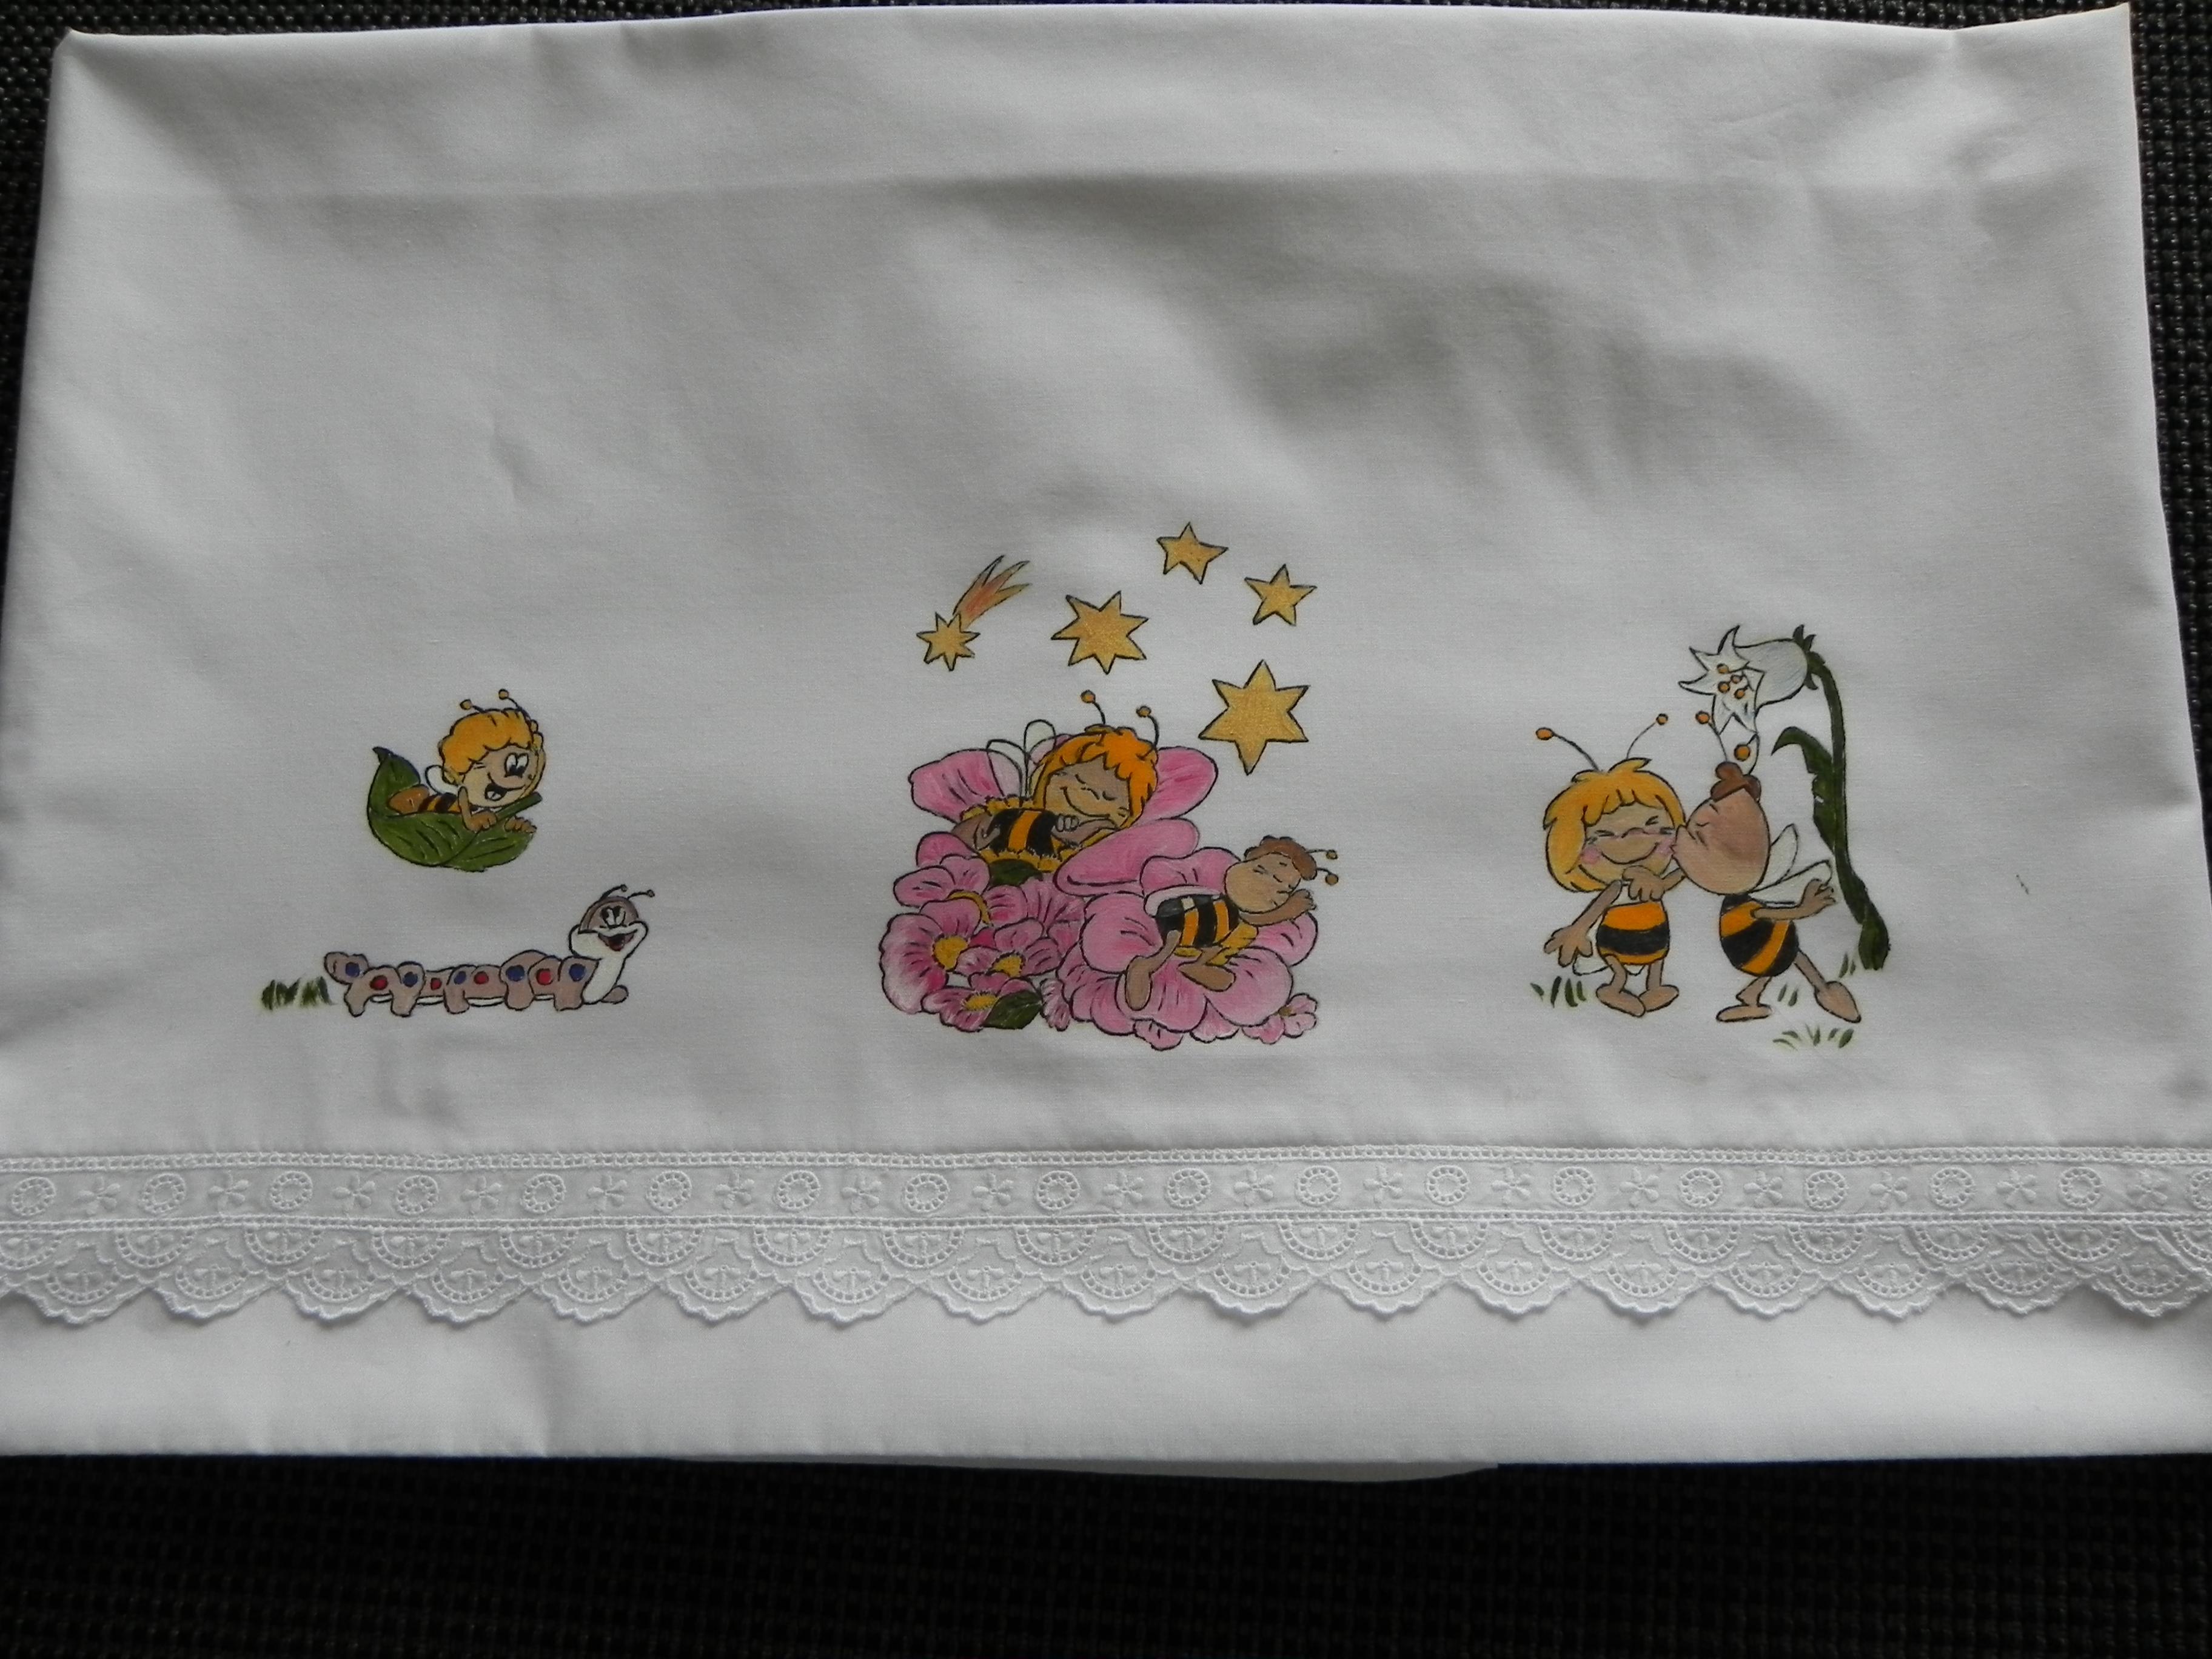 Pintura en tela sabana de cuna abeja maya fabric paint infant bedding bee maya tijeras y - Dibujos para pintar en tela infantiles ...